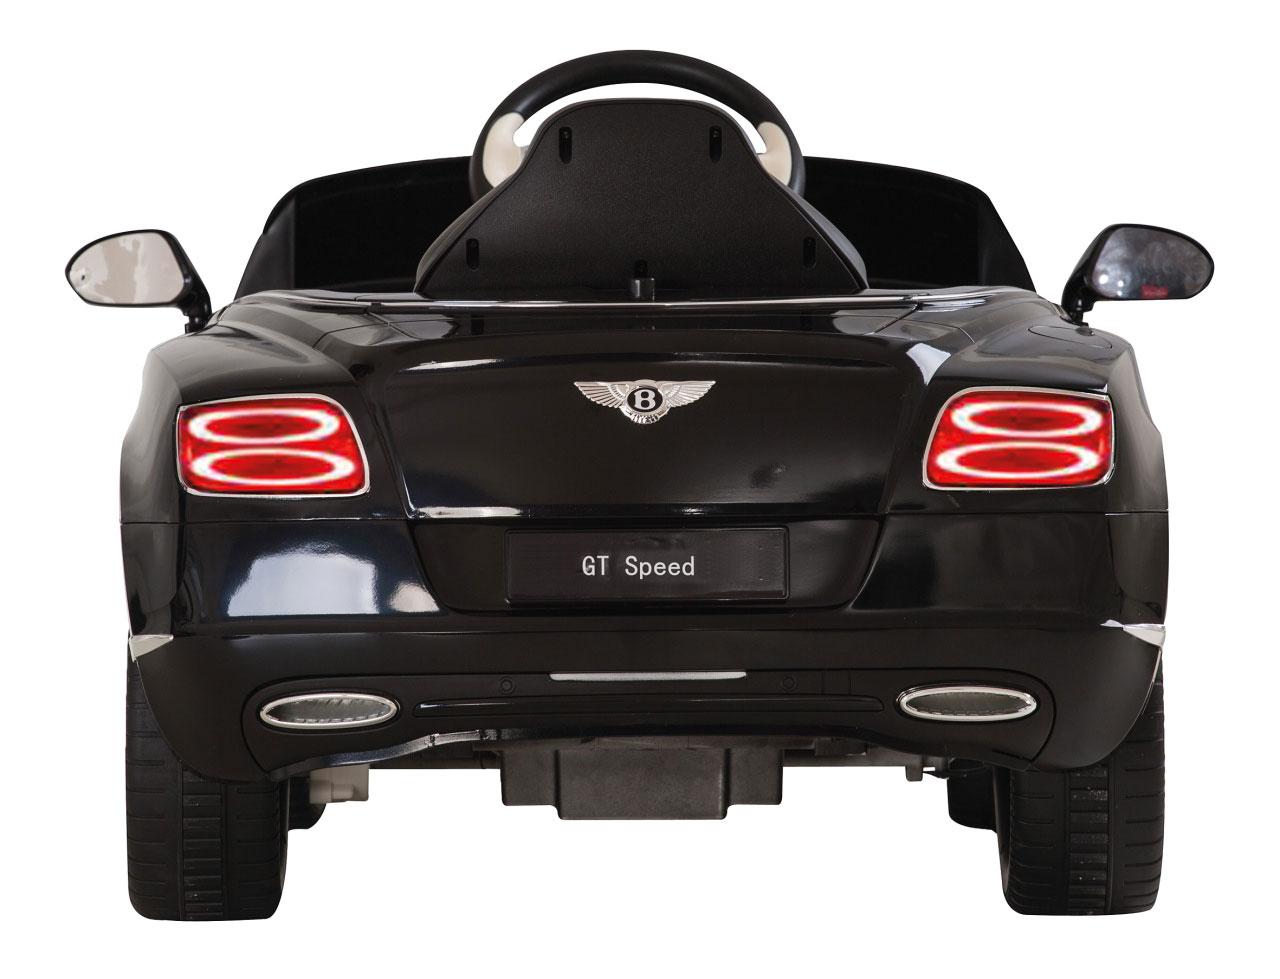 Jamara Kinderfahrzeug Elektroauto Kinder Ride-on Bentley GTC schwarz Bild 2